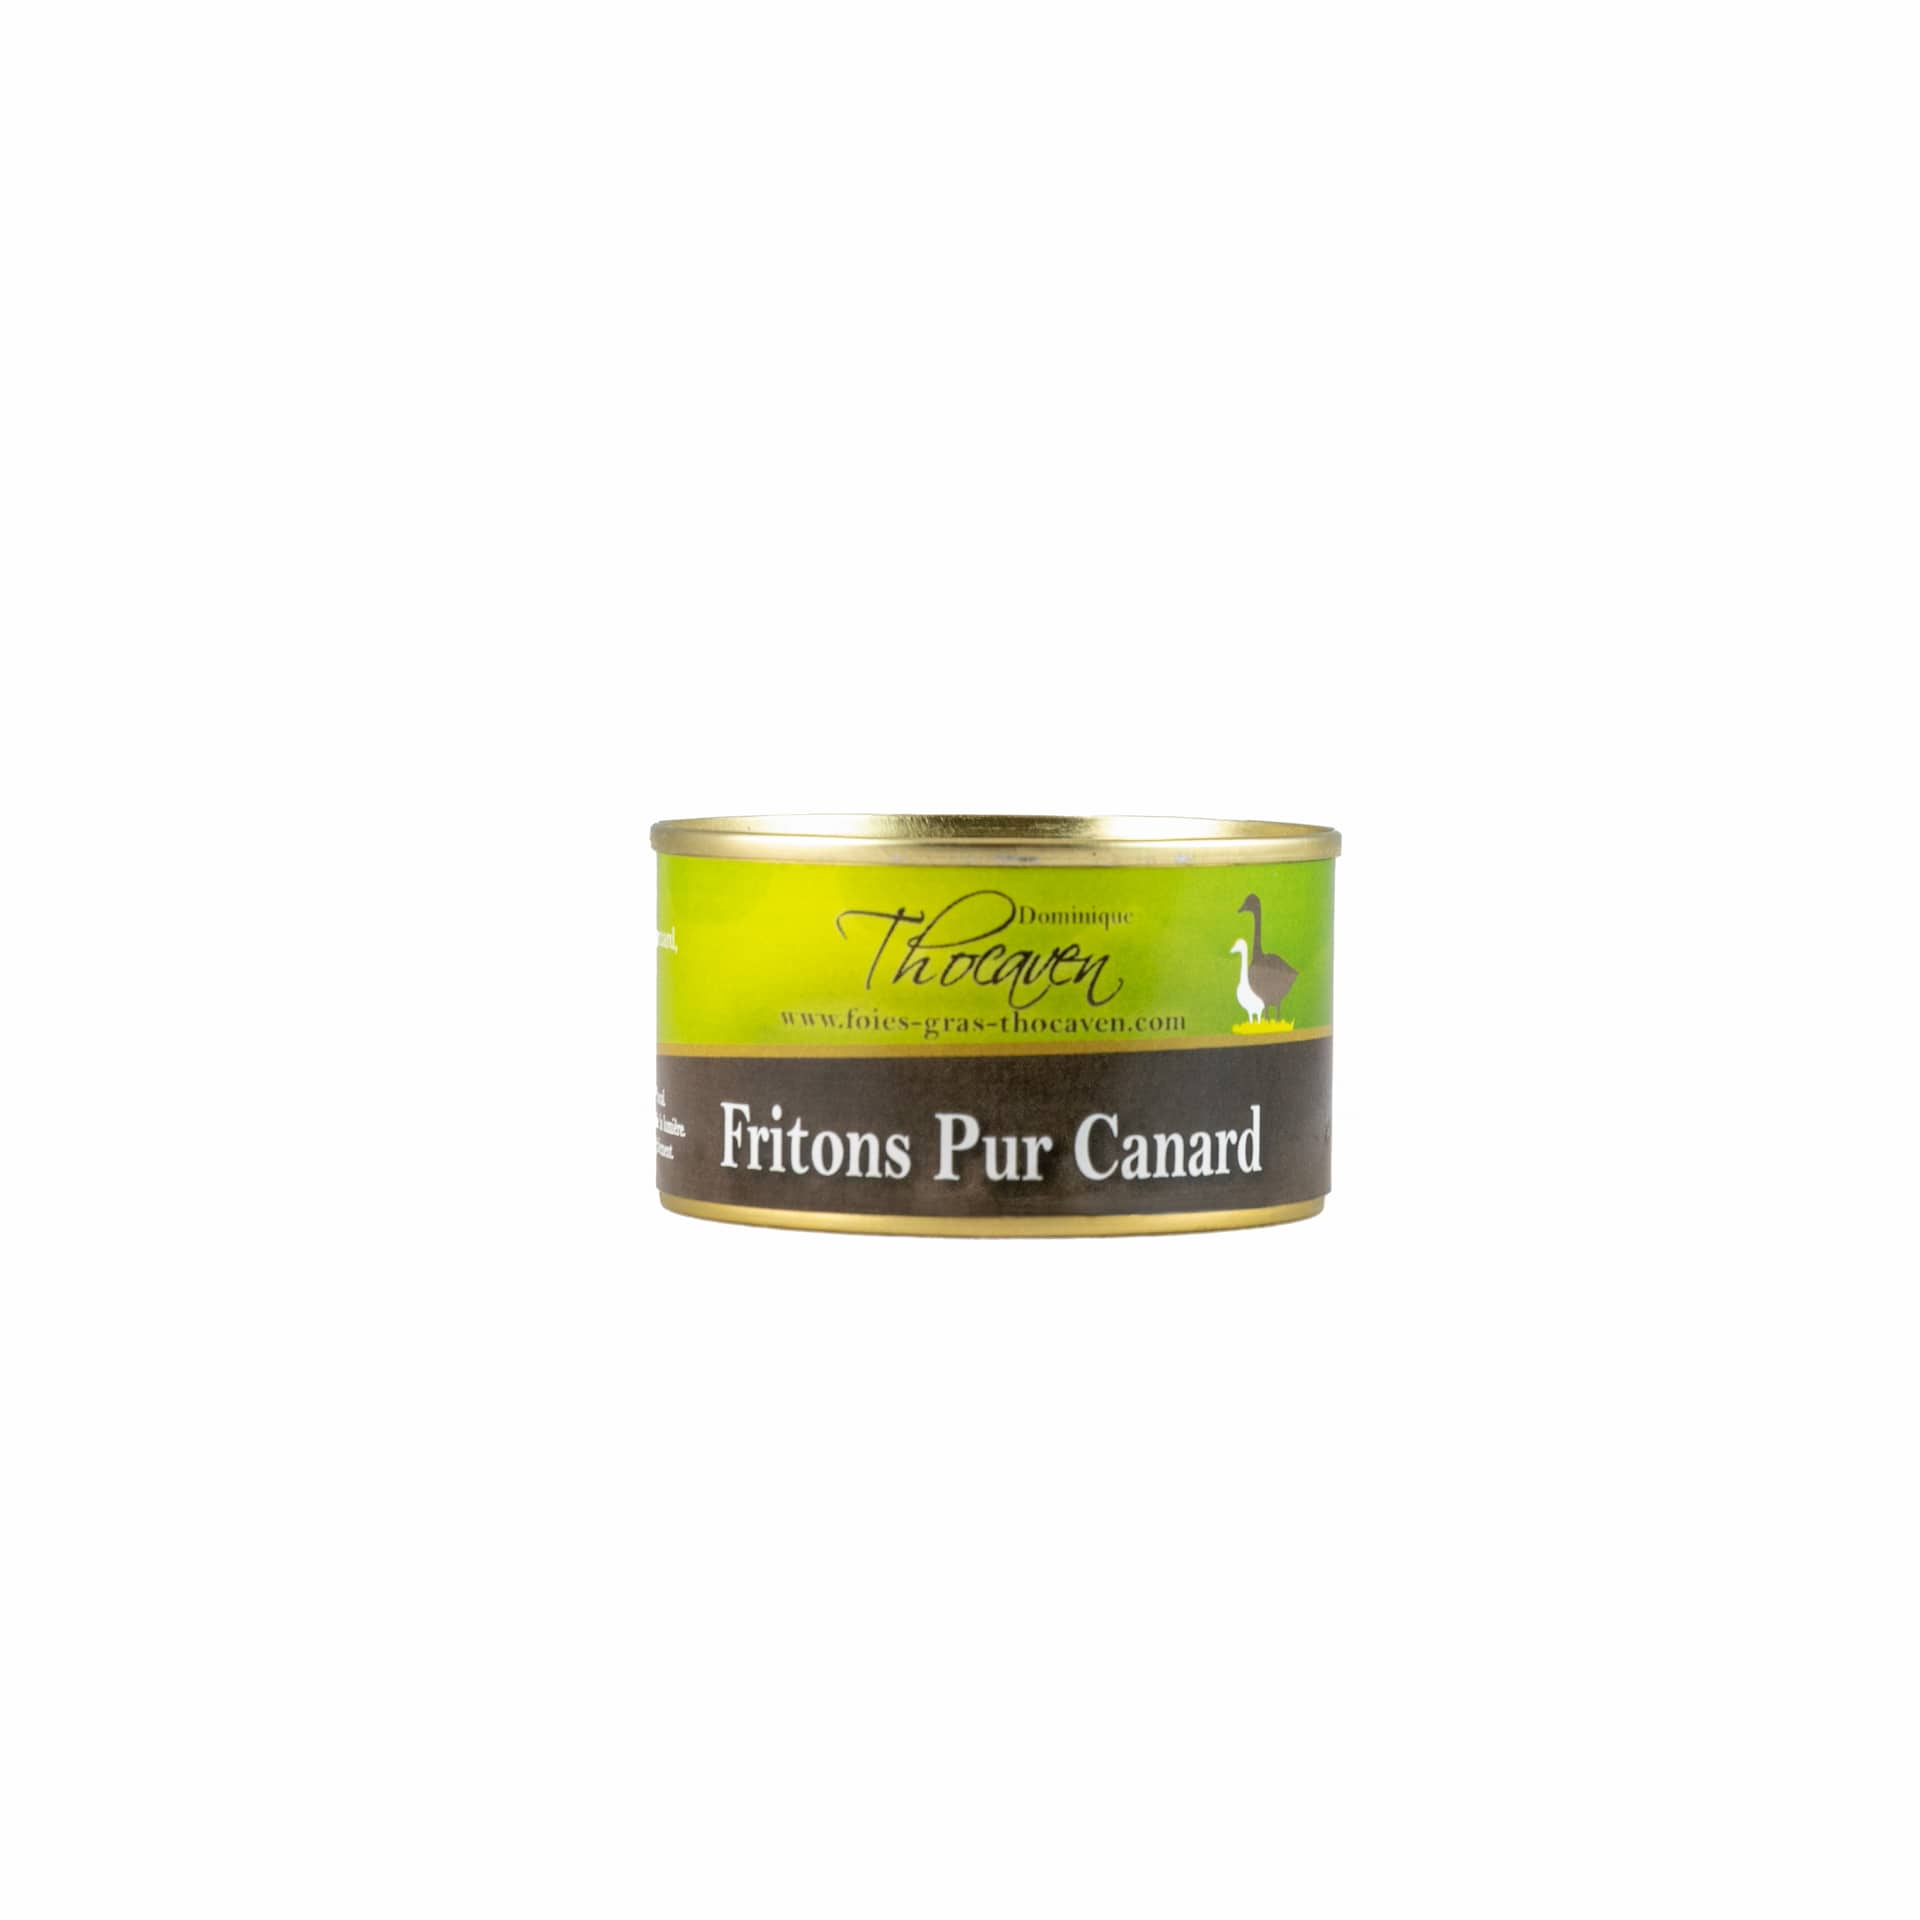 Fritons pur canard - Fabrication artisanale